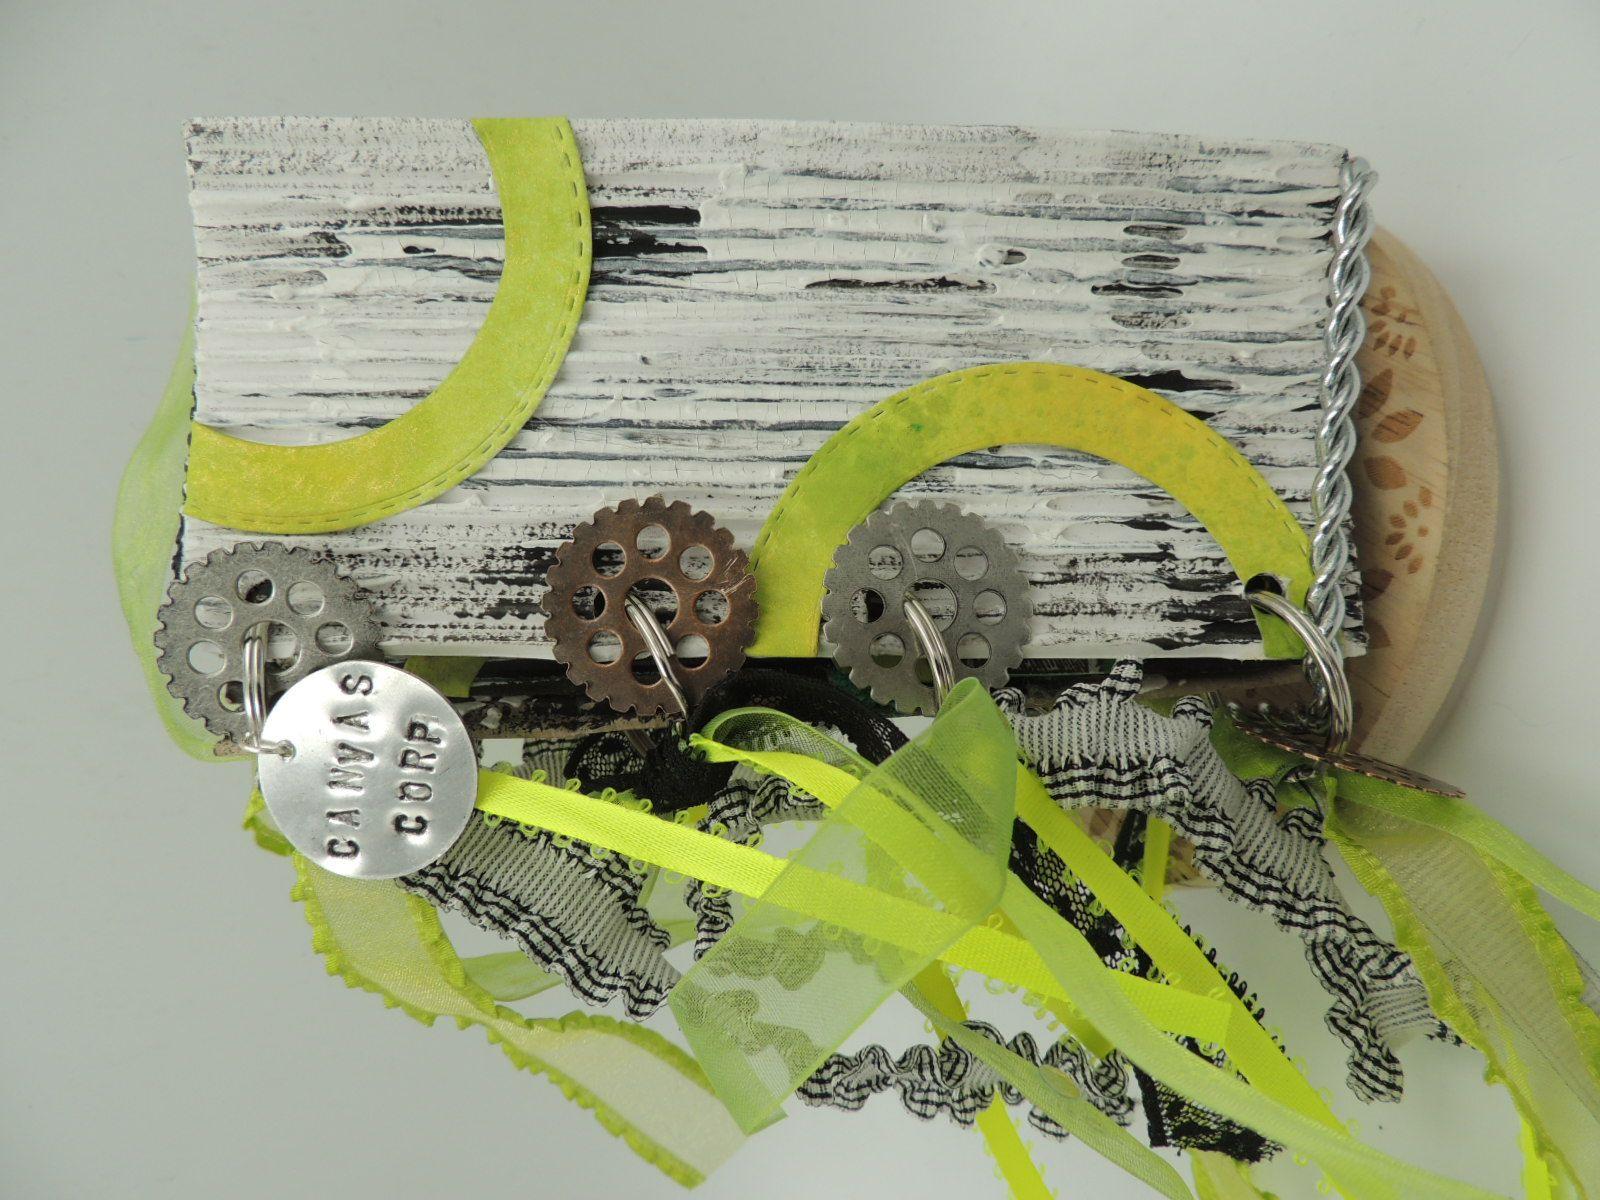 Green mean mini album with canvas corp mini albums